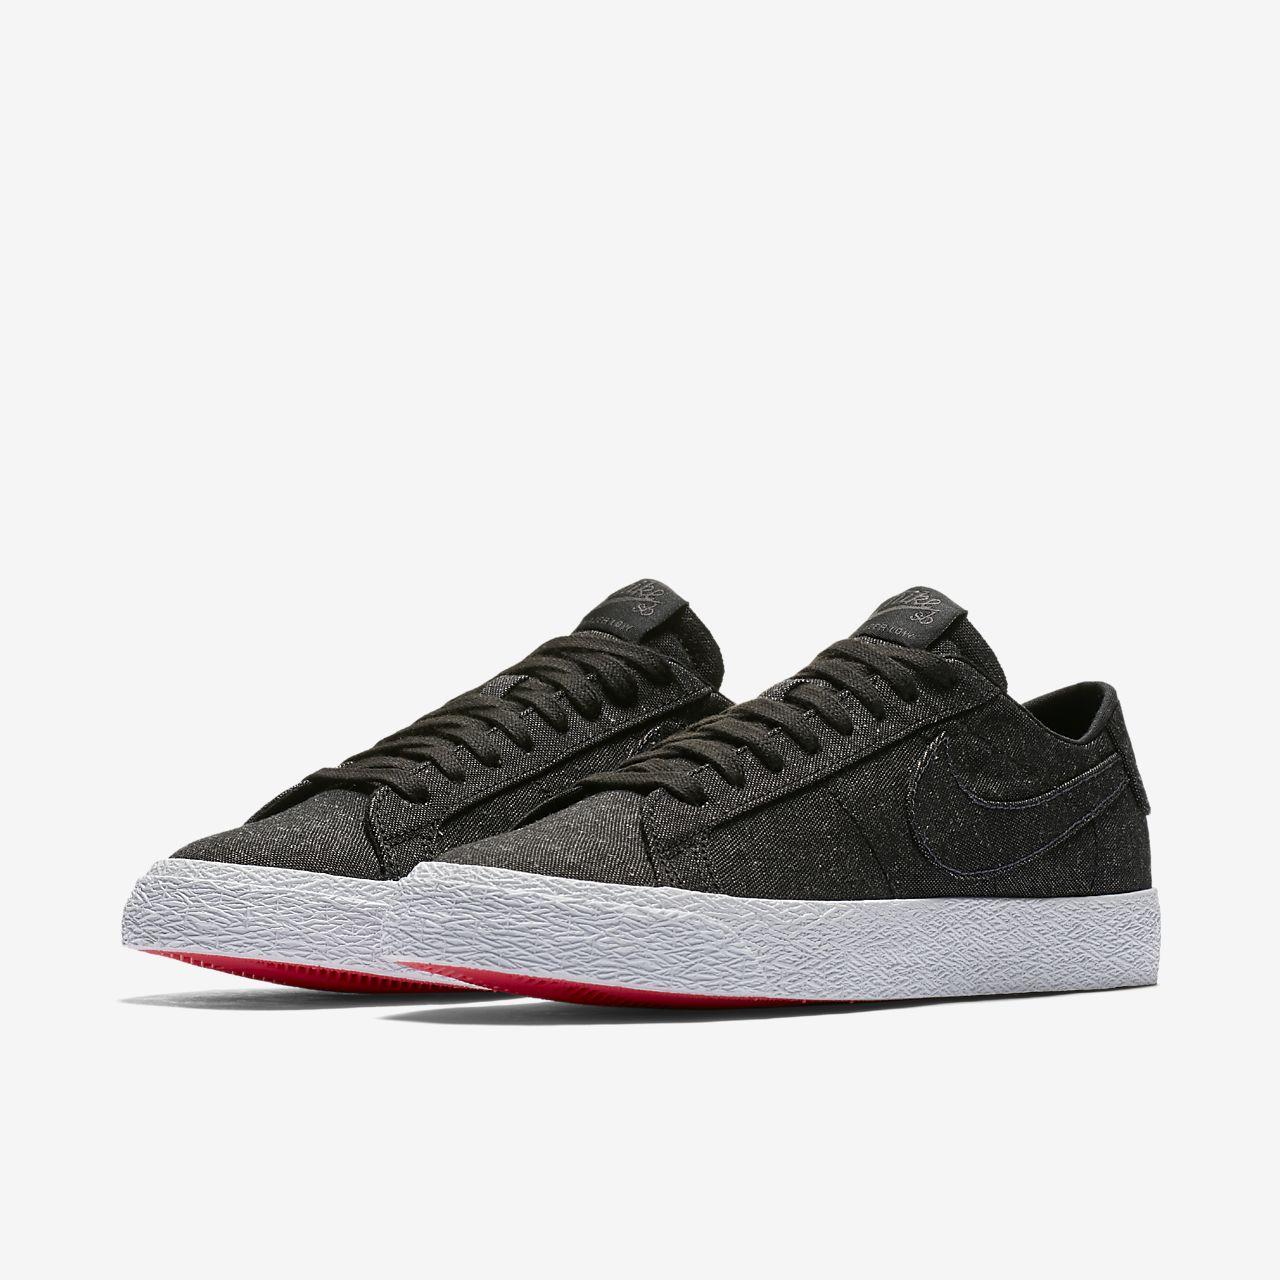 promo code a4cc0 691e5 ... Skateboardsko Nike SB Zoom Blazer Low Canvas Deconstructed för män